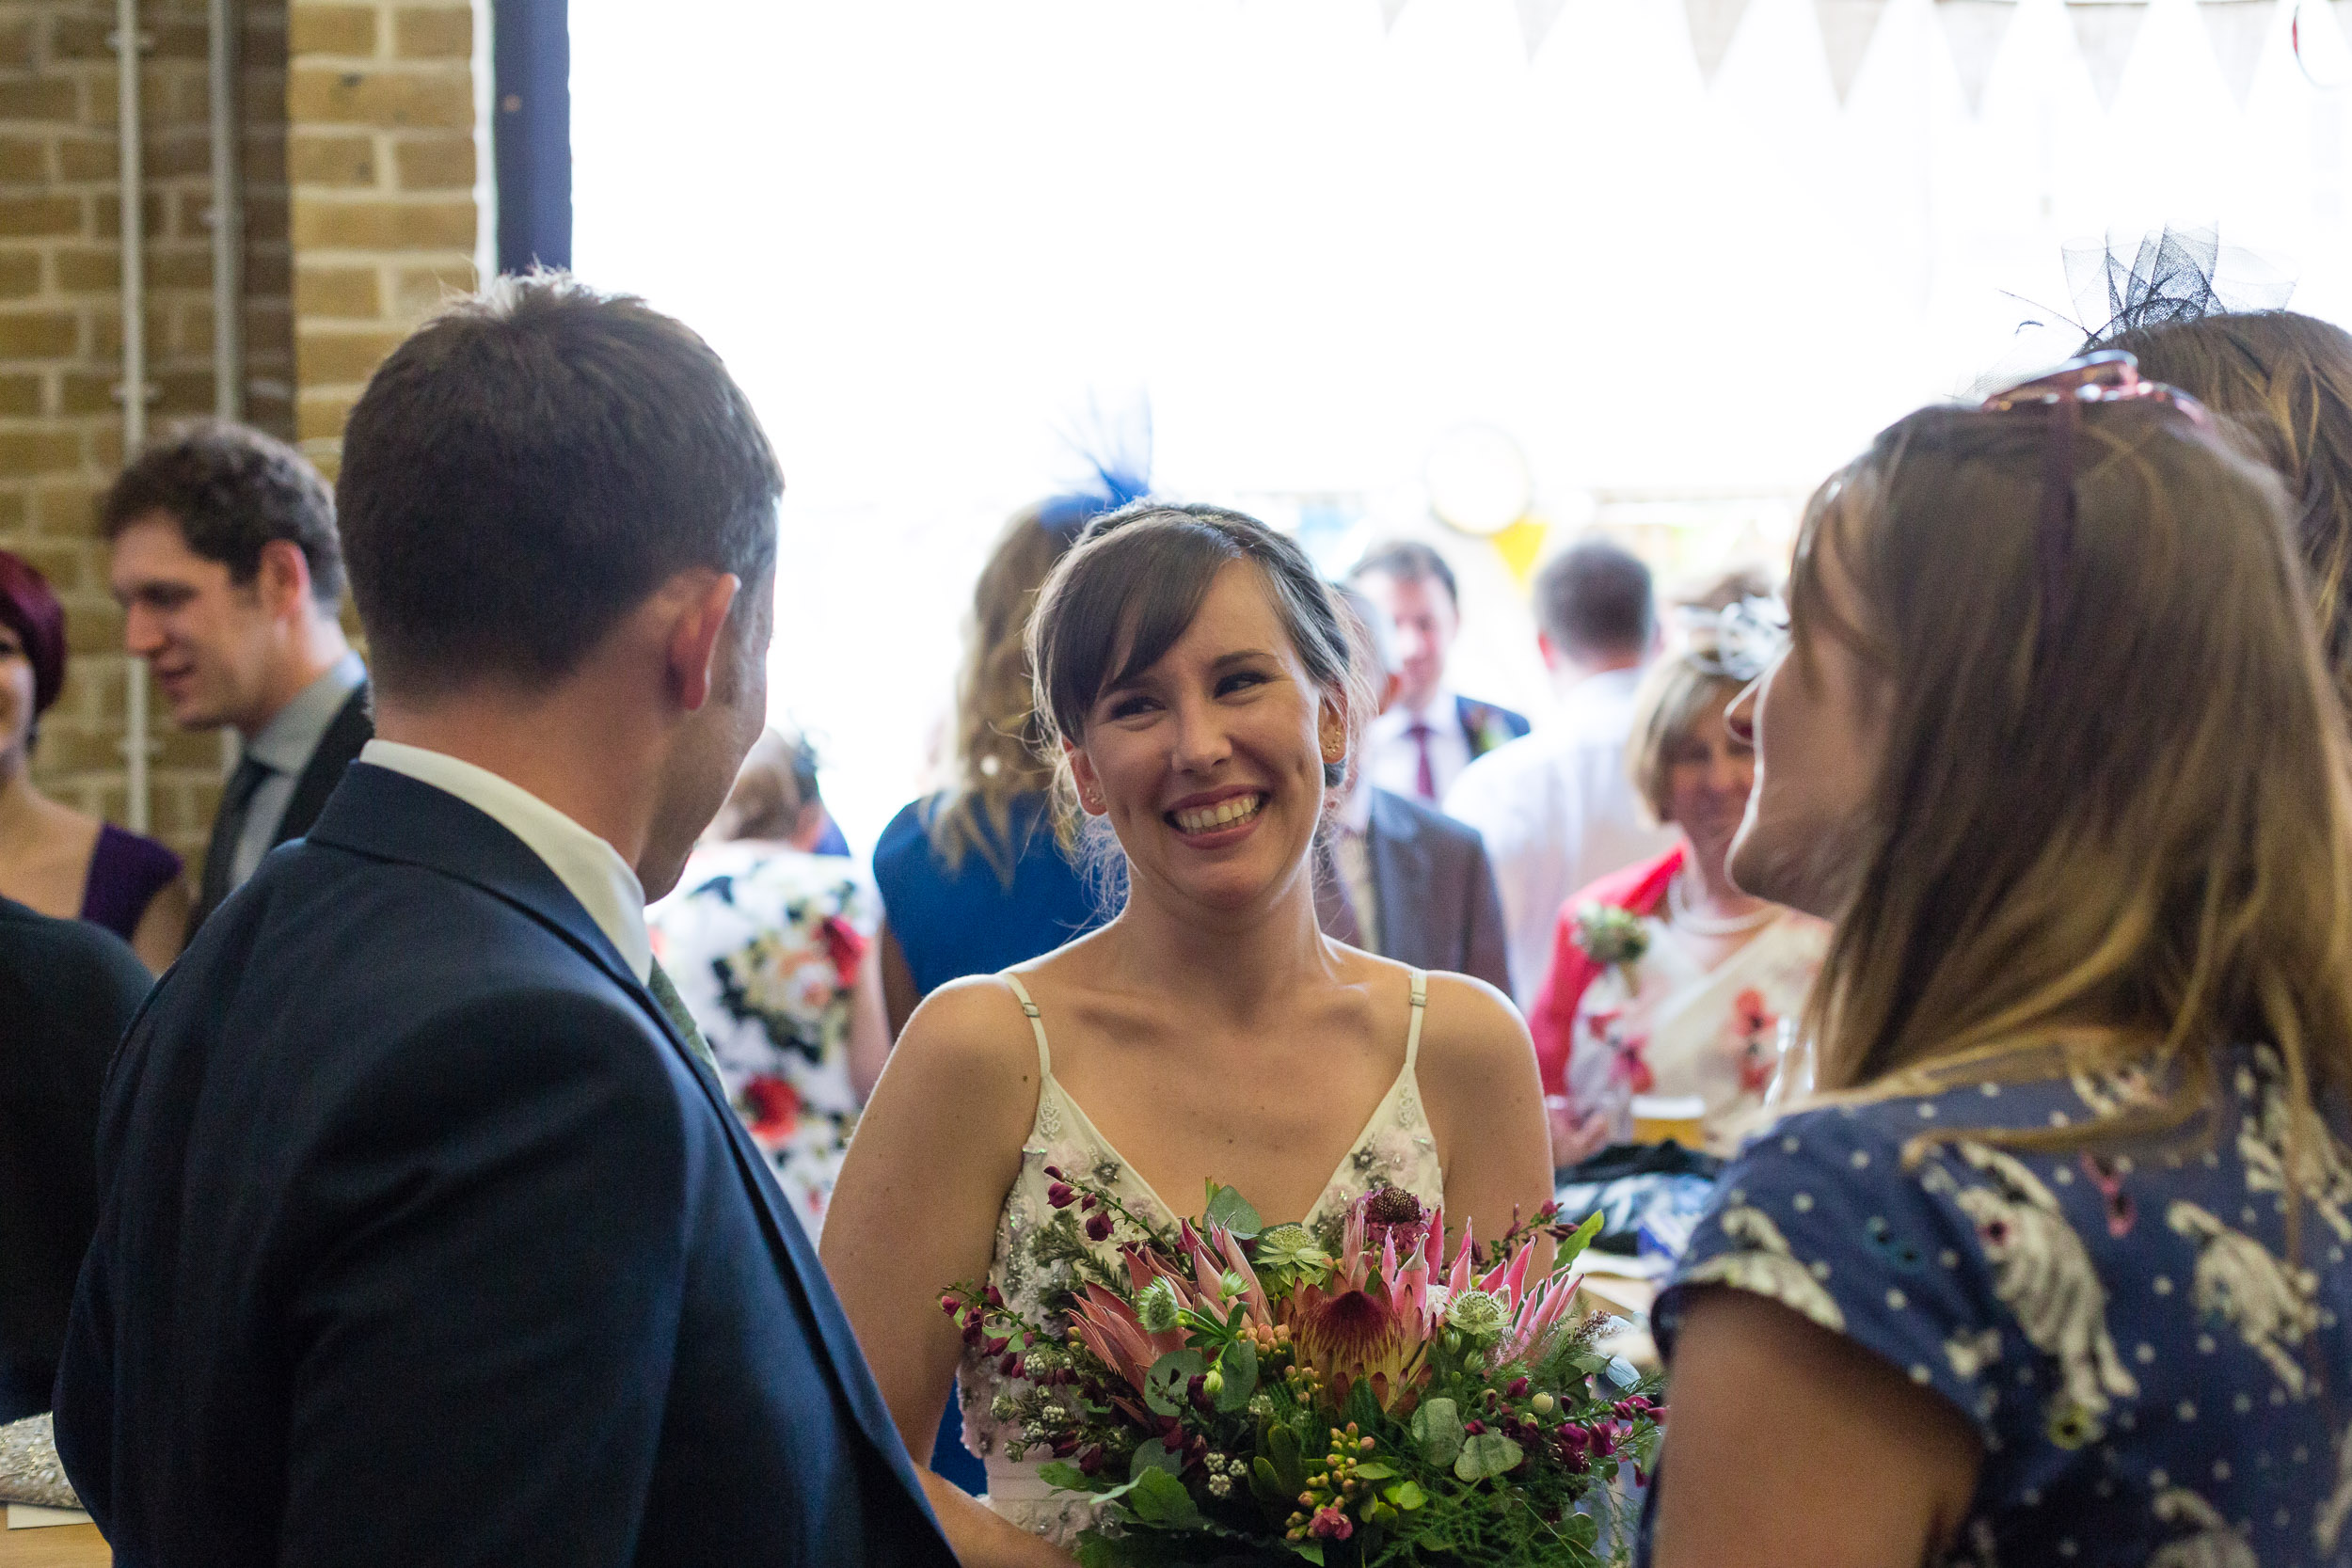 brockwell-lido-brixton-herne-hill-wedding-078.jpg